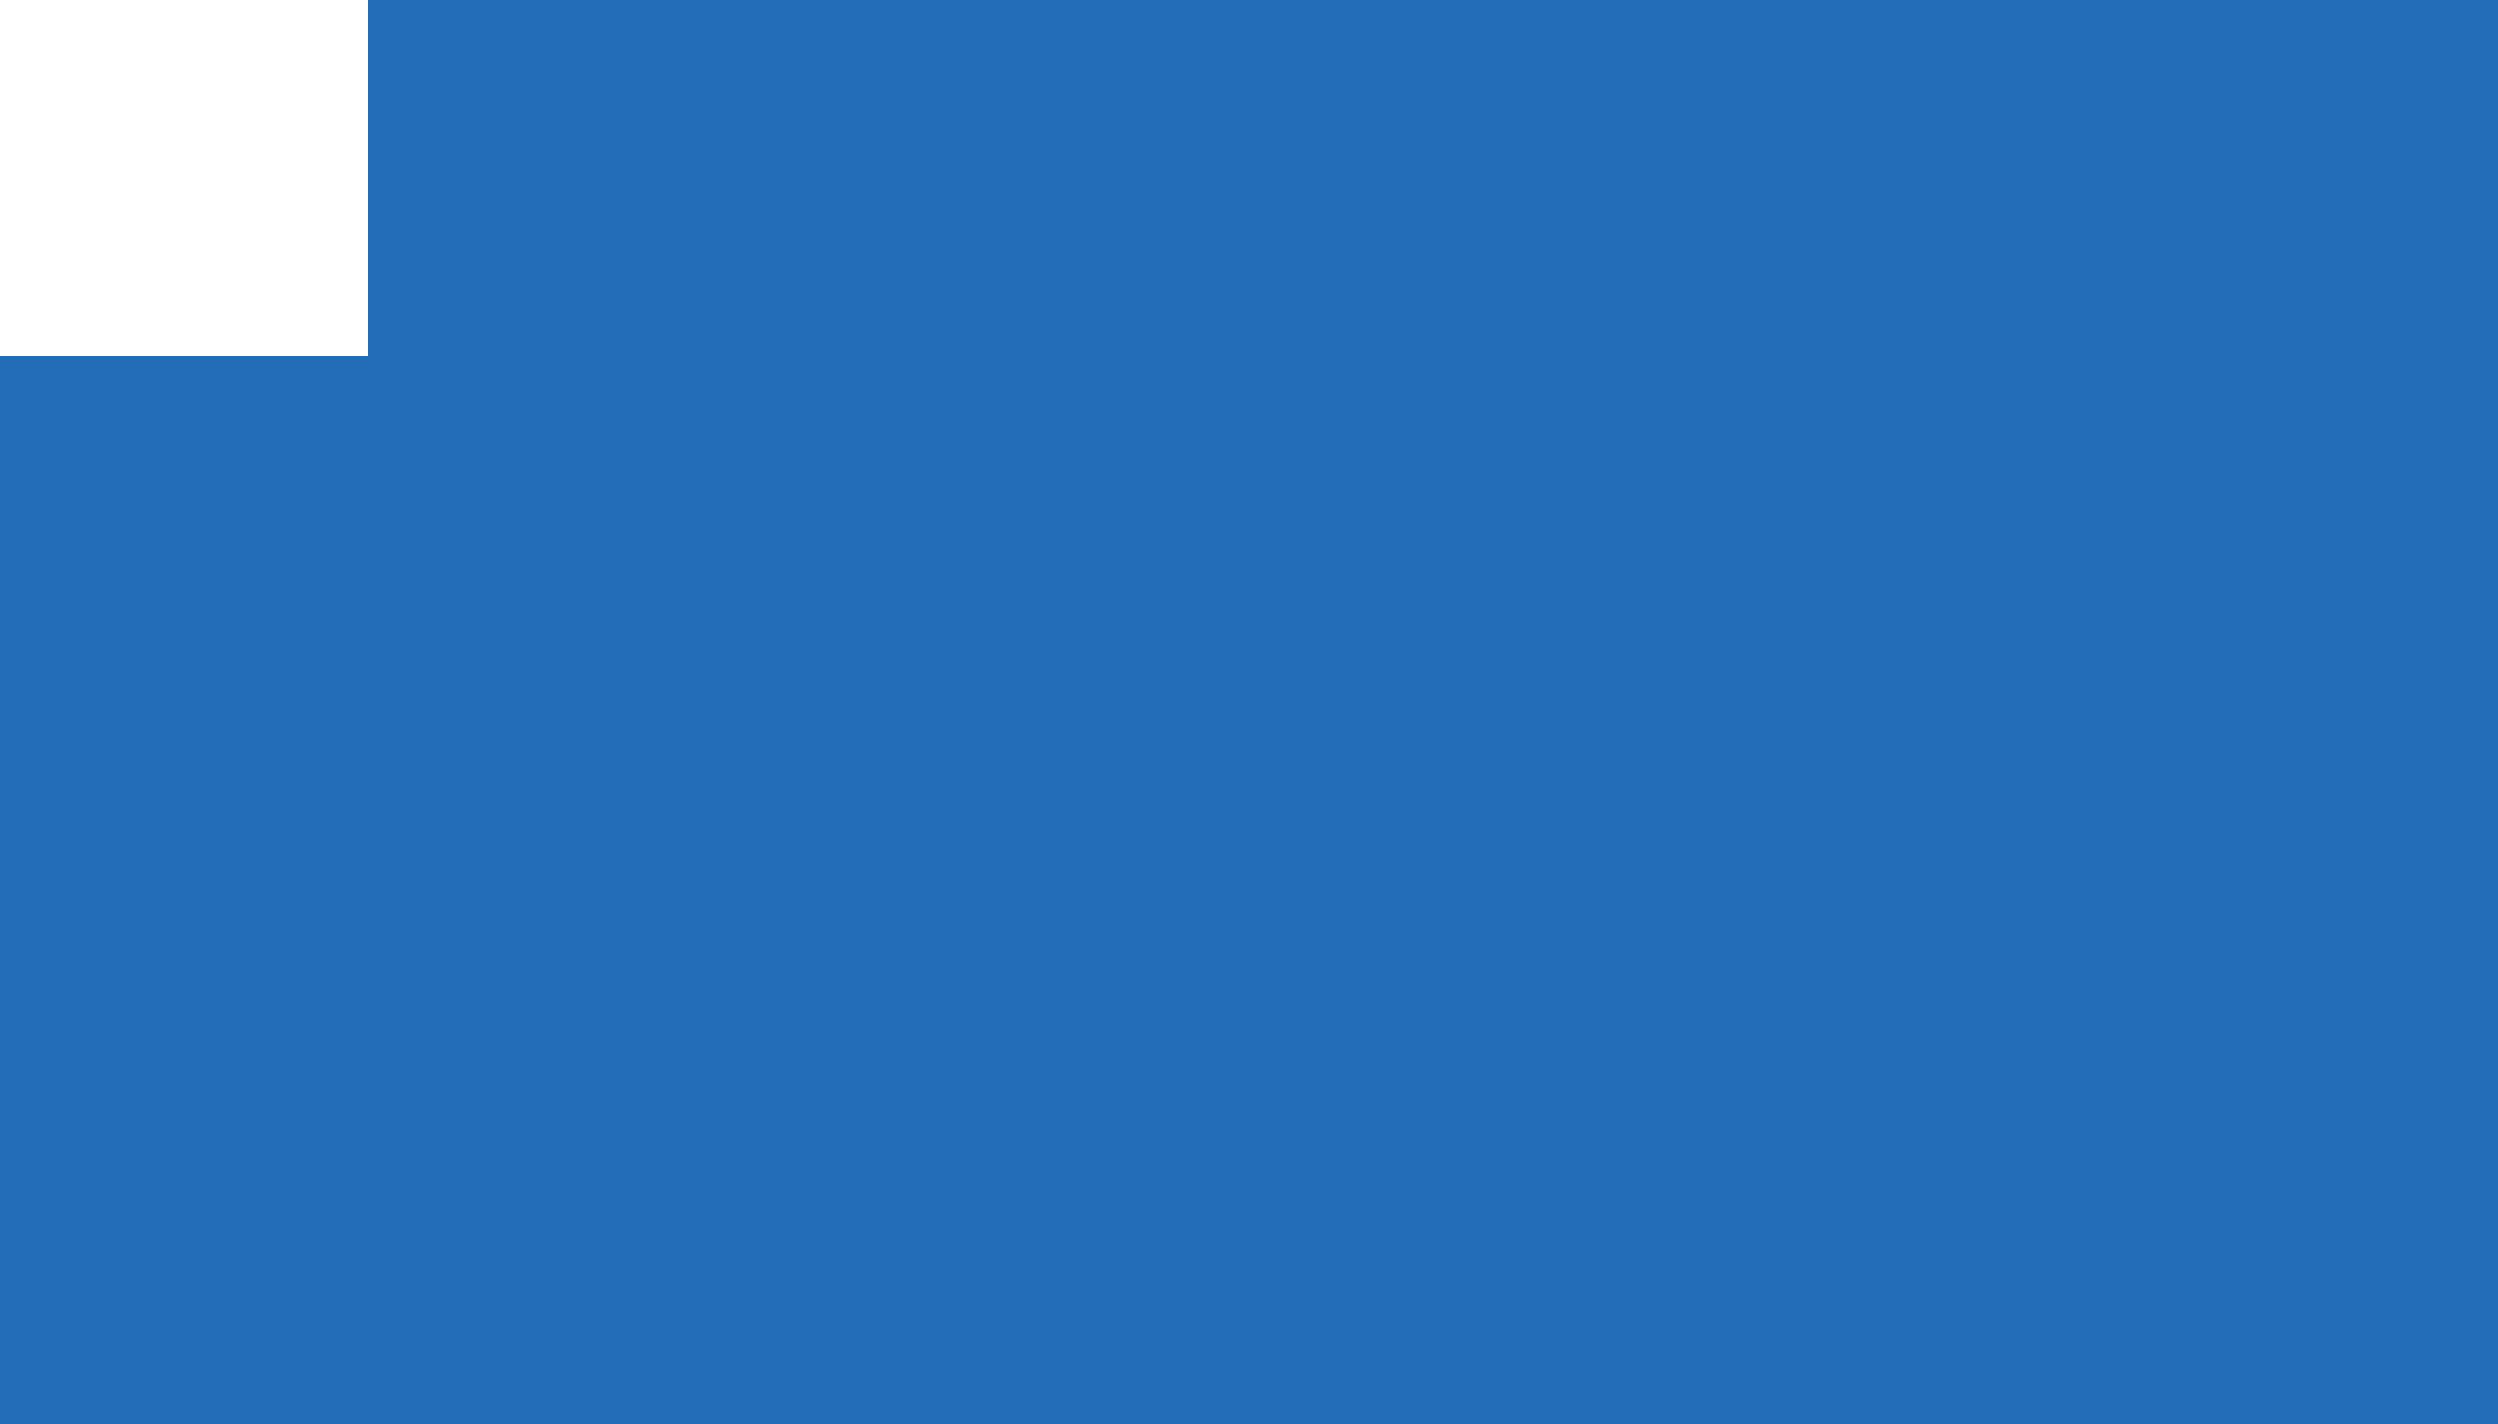 Equiworld